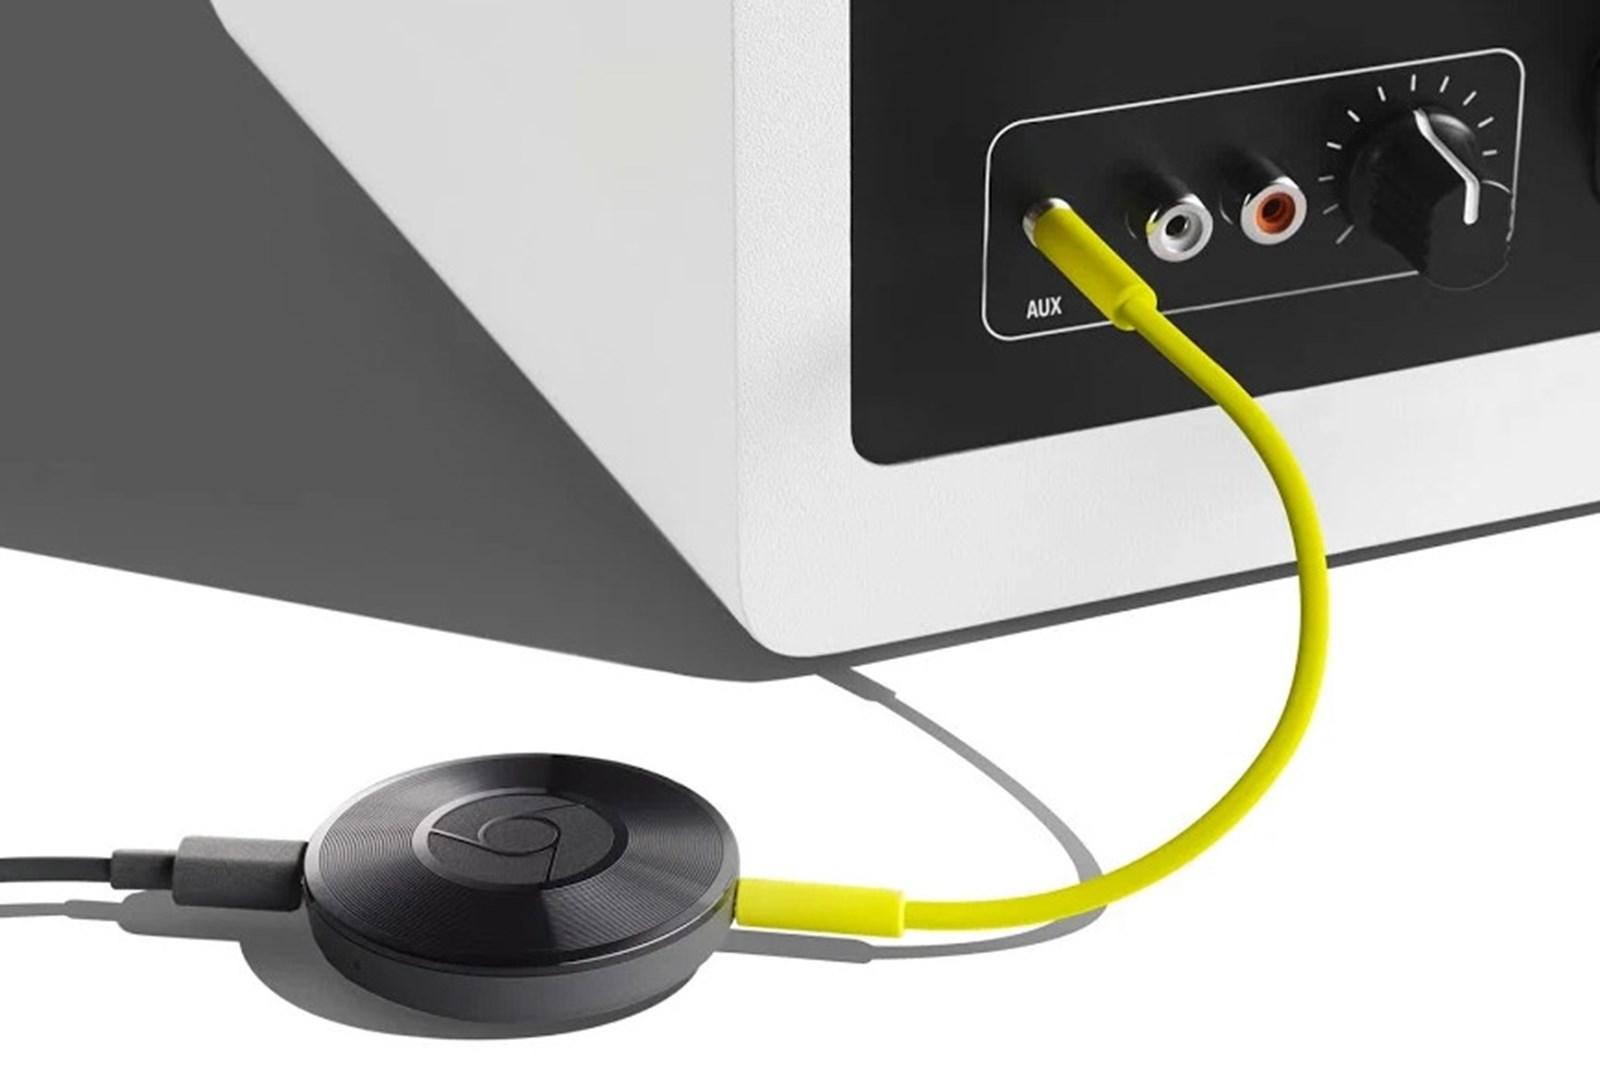 Google stellt Chromecast Audio ein